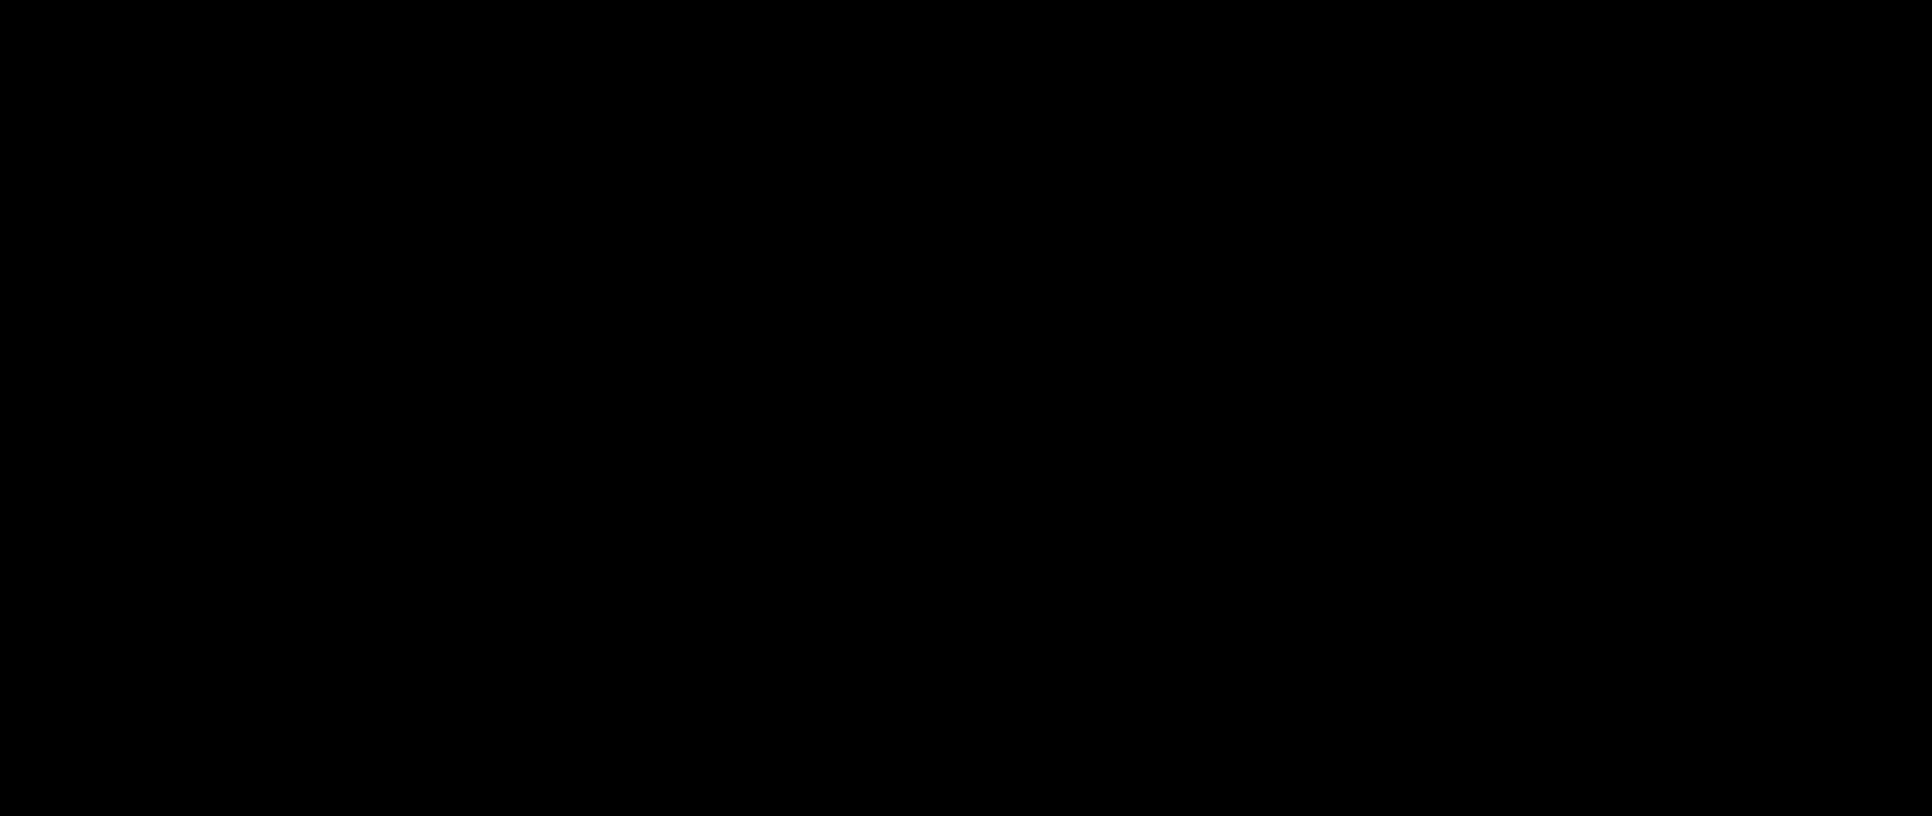 upd-alloc -graph 2x